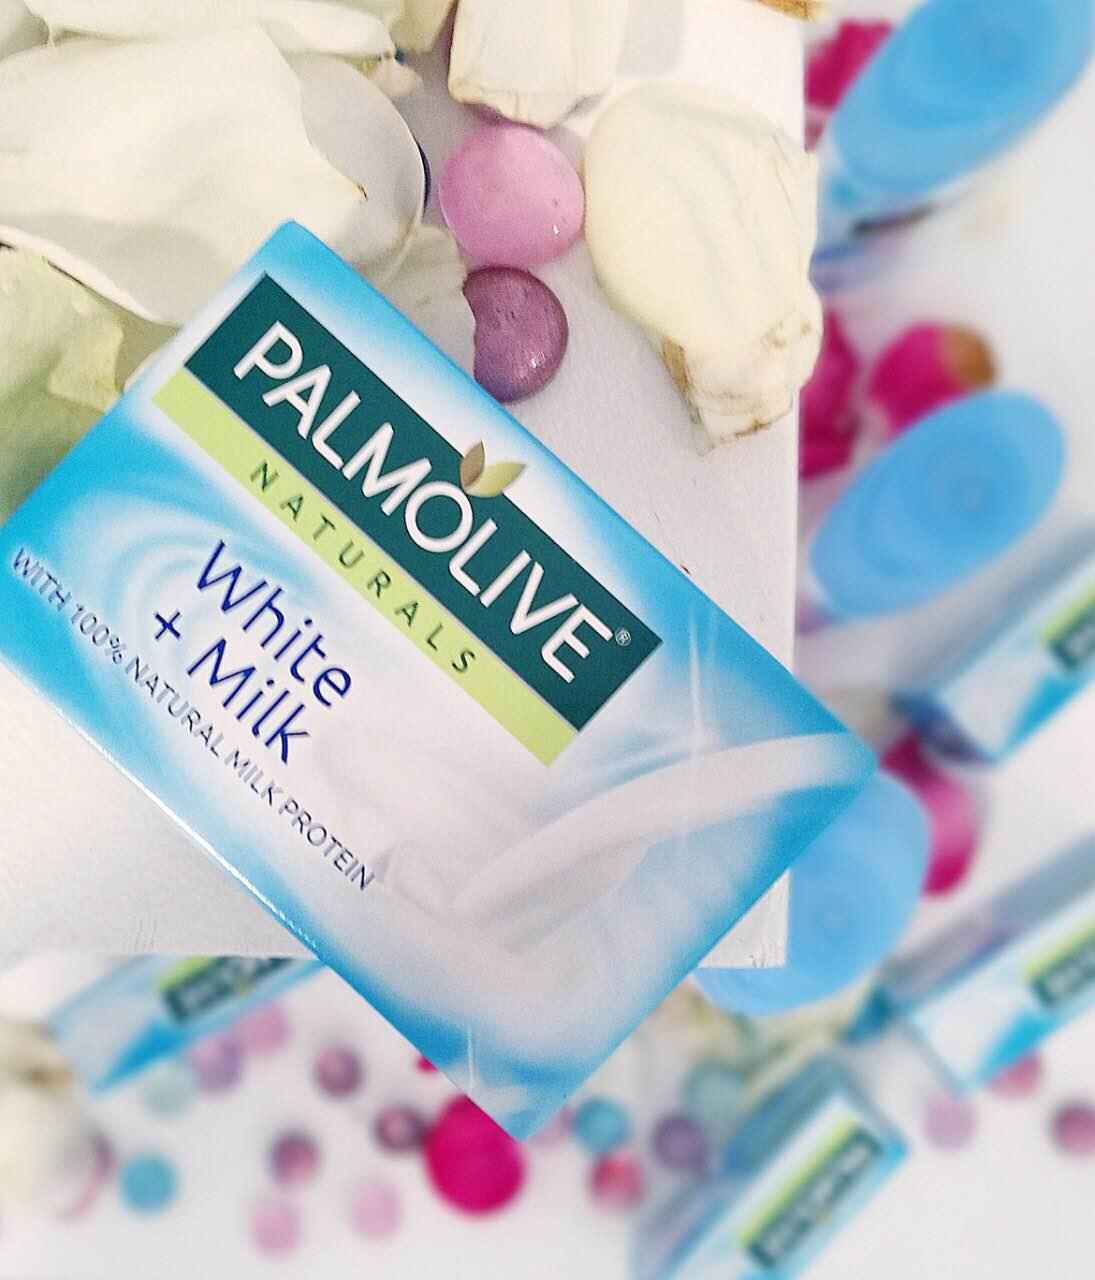 8.1 8 Palmolive Naturals White plus Milk